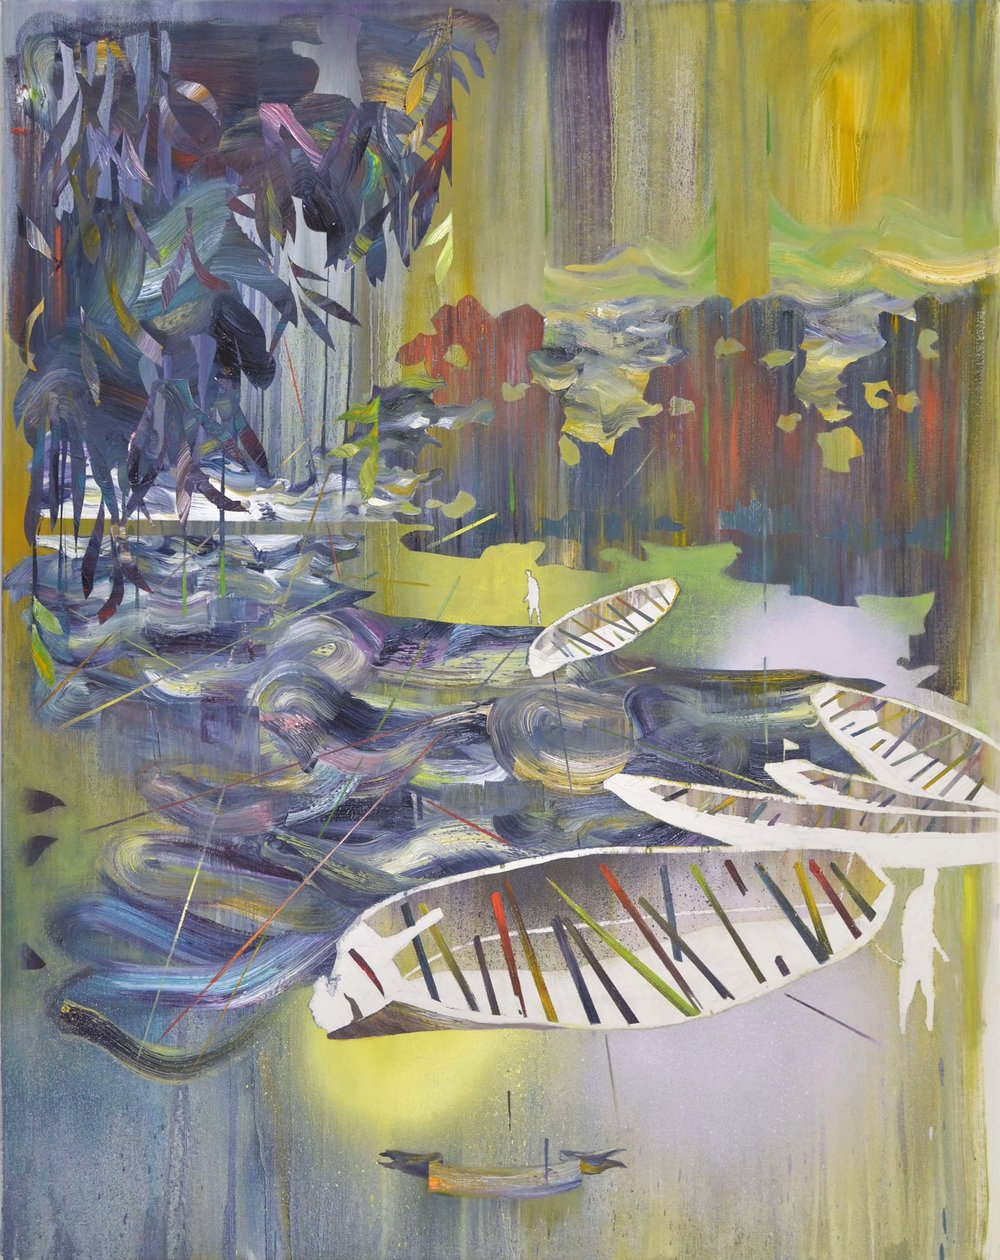 Mikado  oil on canvas 120 x 95 cm, 2015